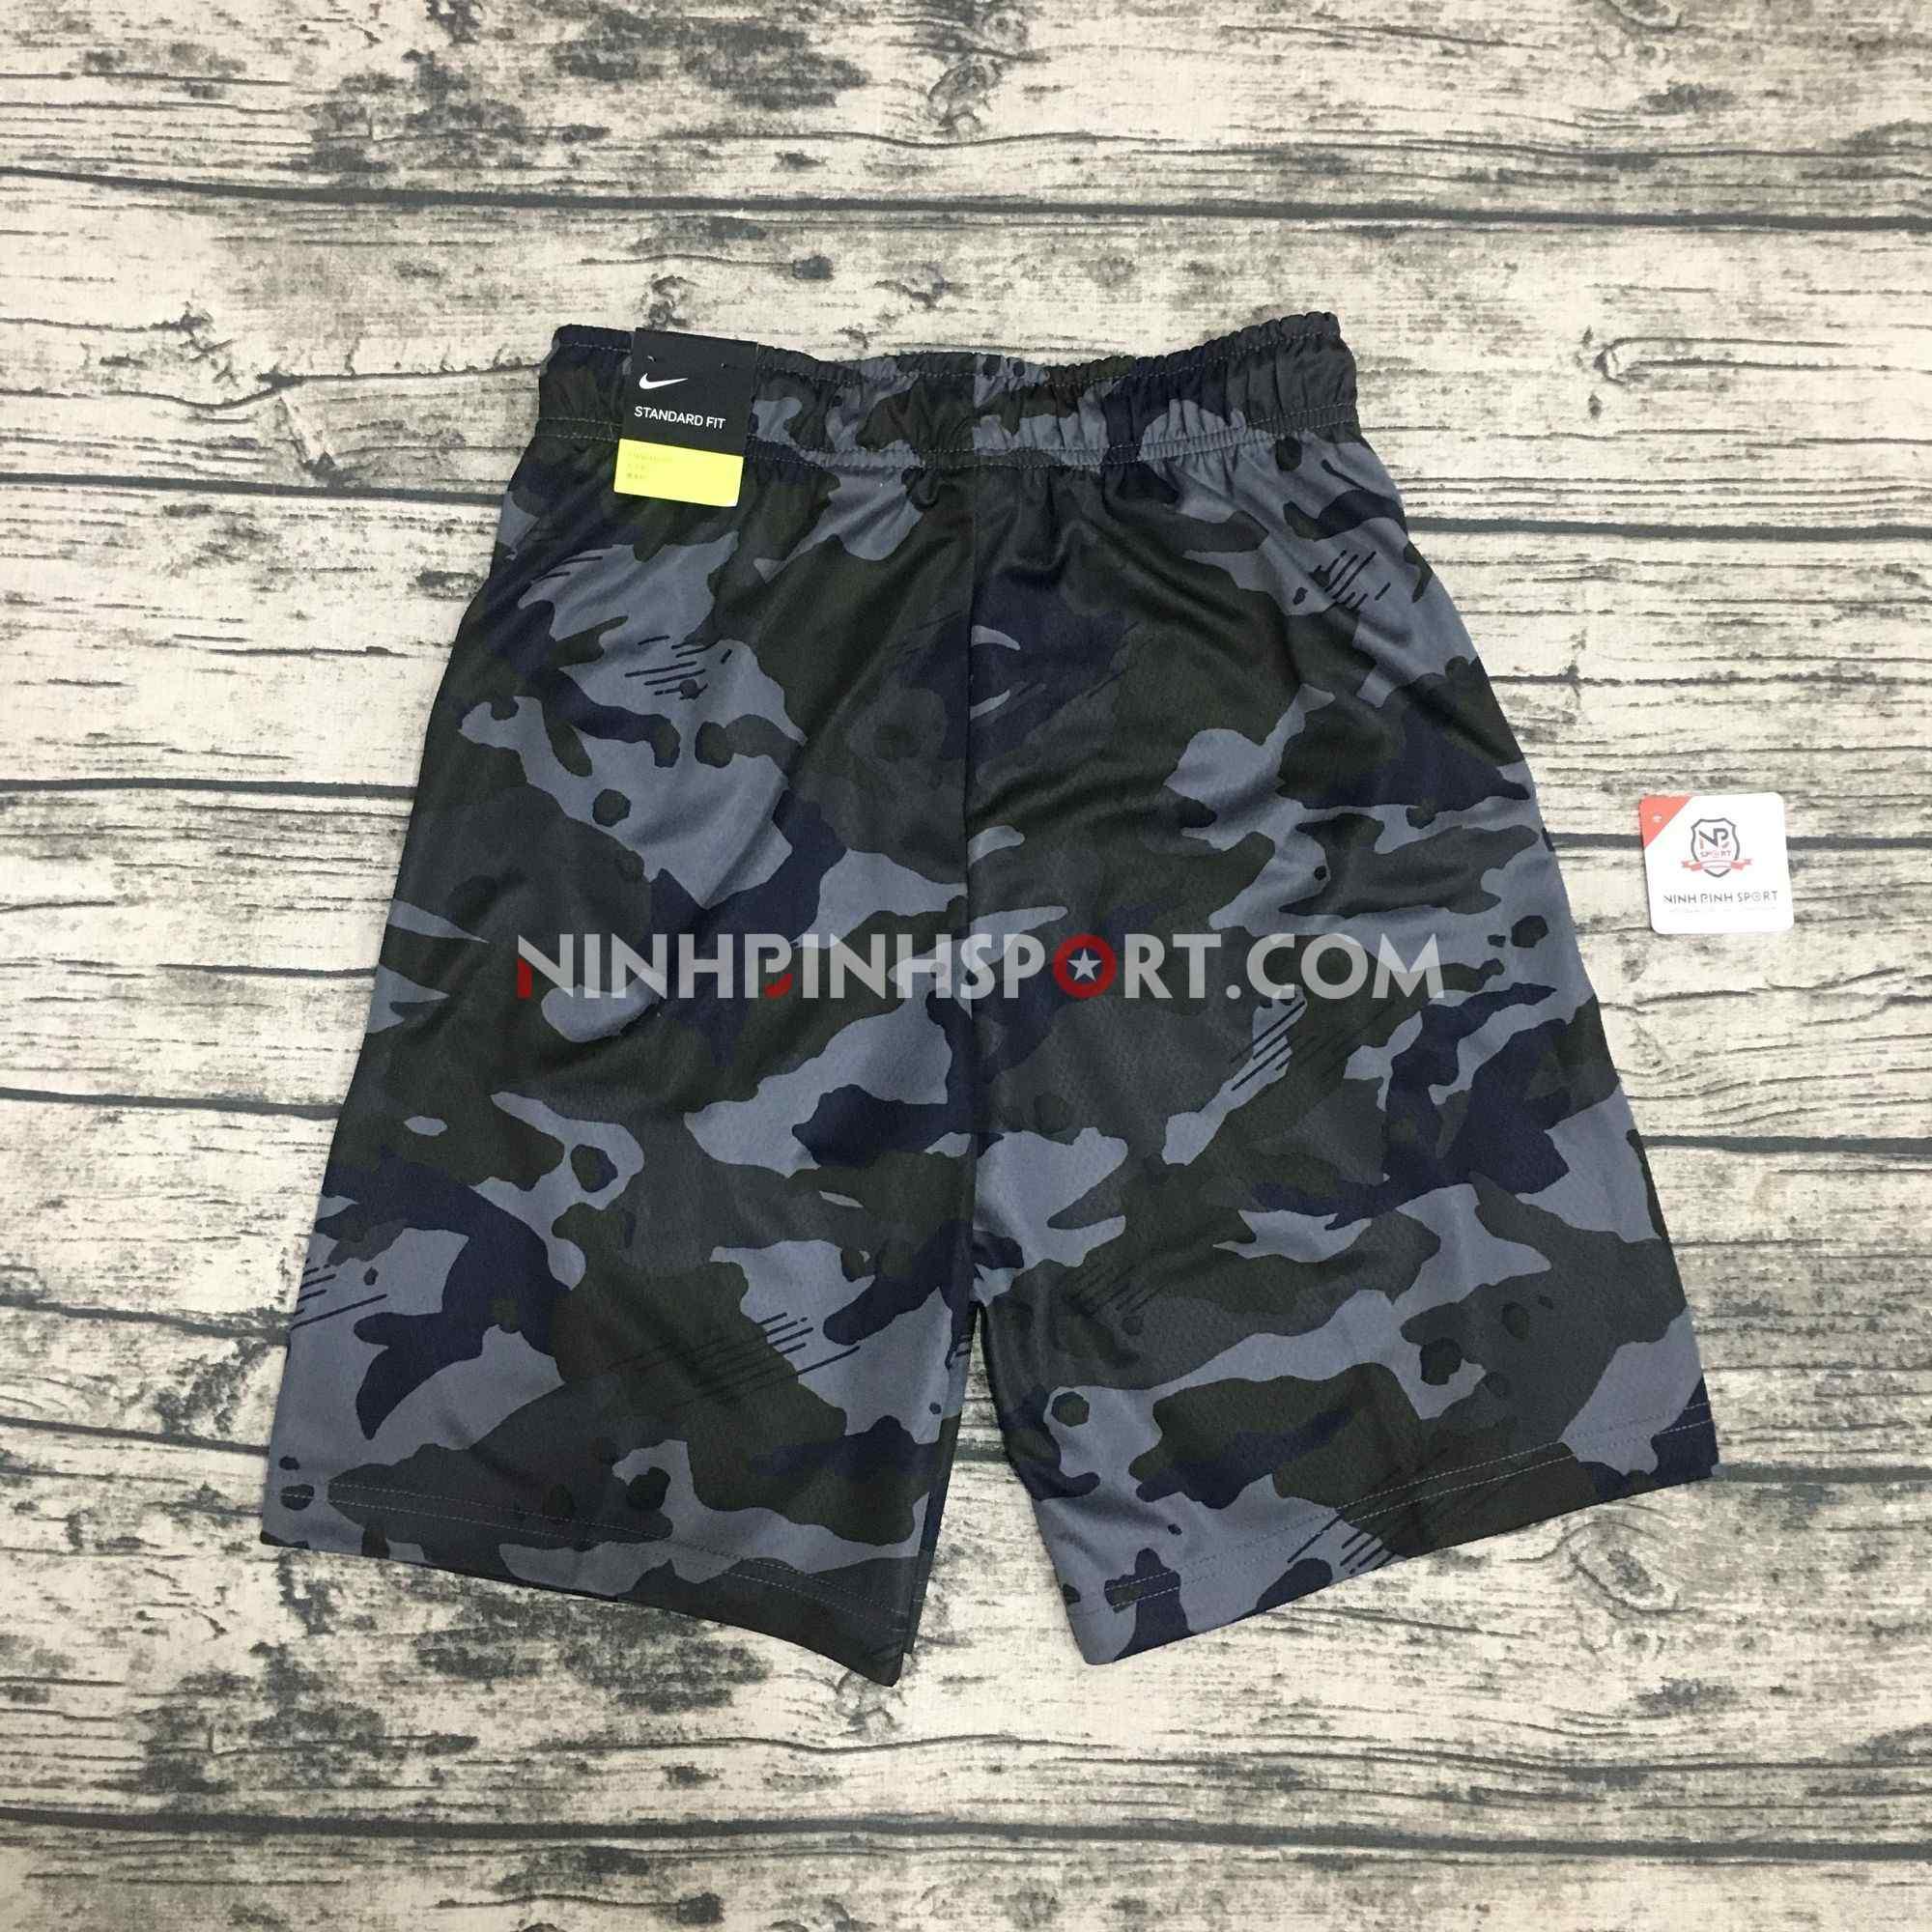 Quần thể thao nam Nike Dri-Fit Knit Camo AQ1145-060